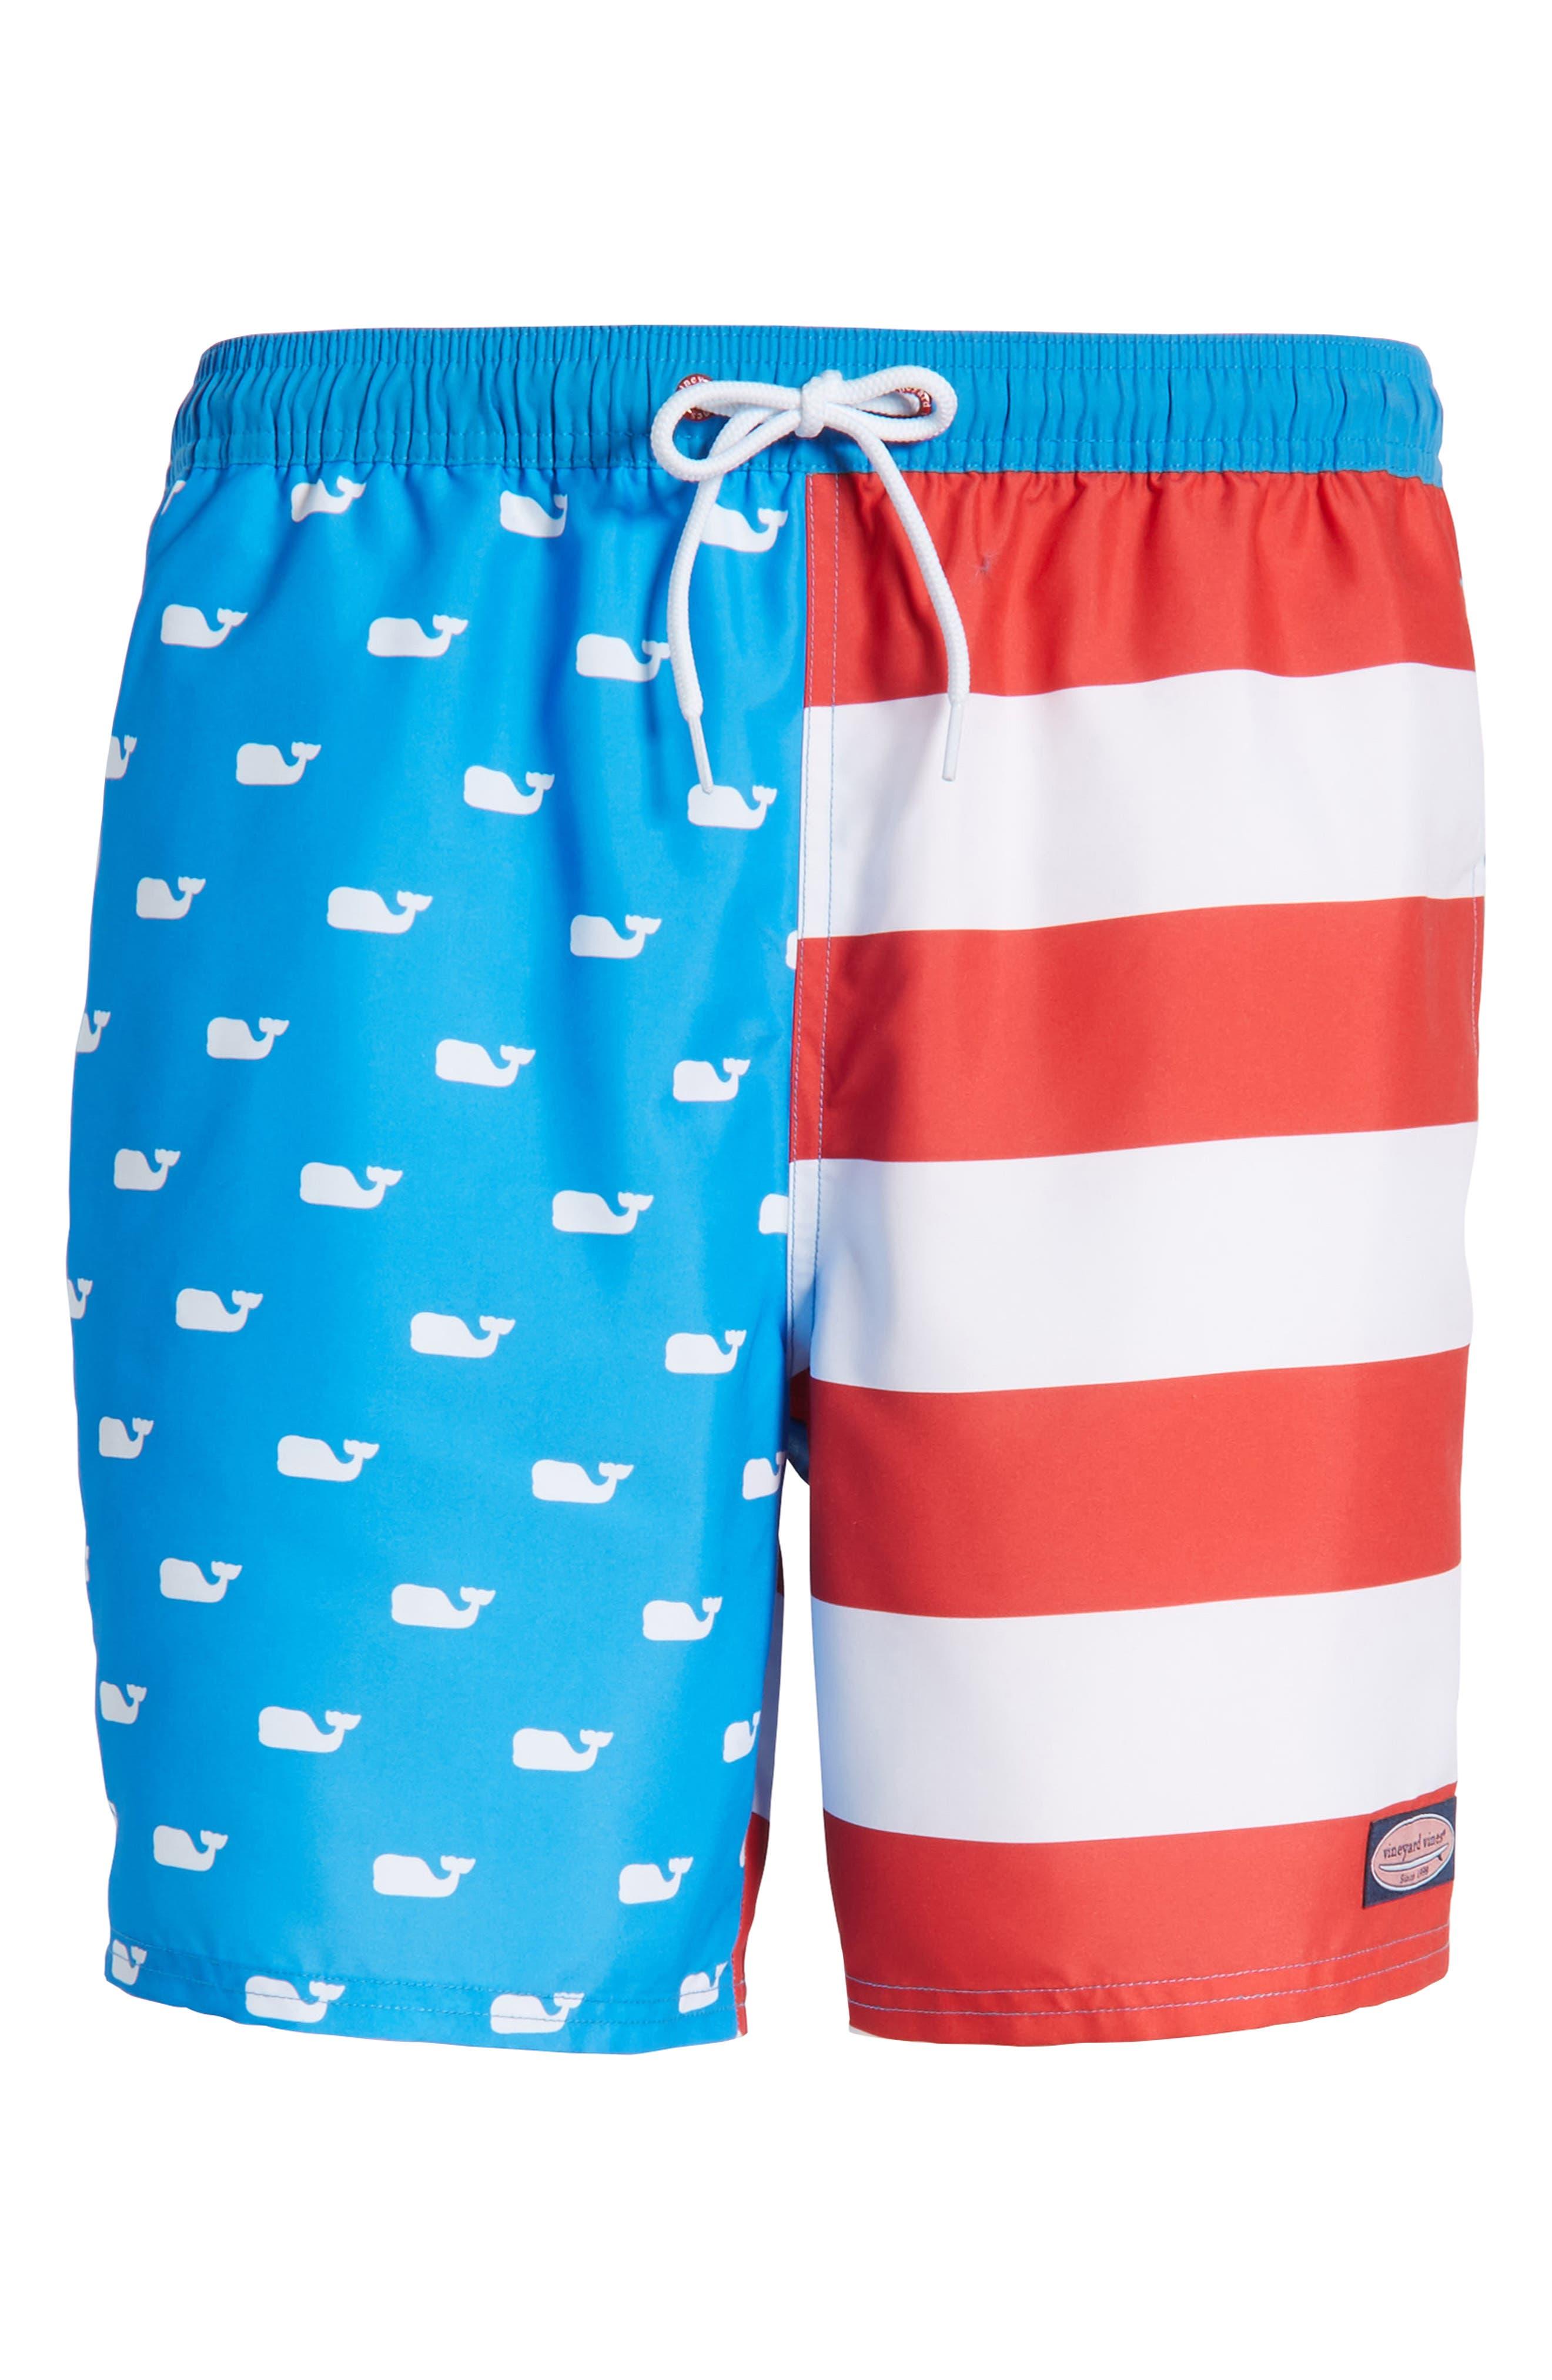 Whale Flag Chappy Swim Trunks,                             Alternate thumbnail 6, color,                             494